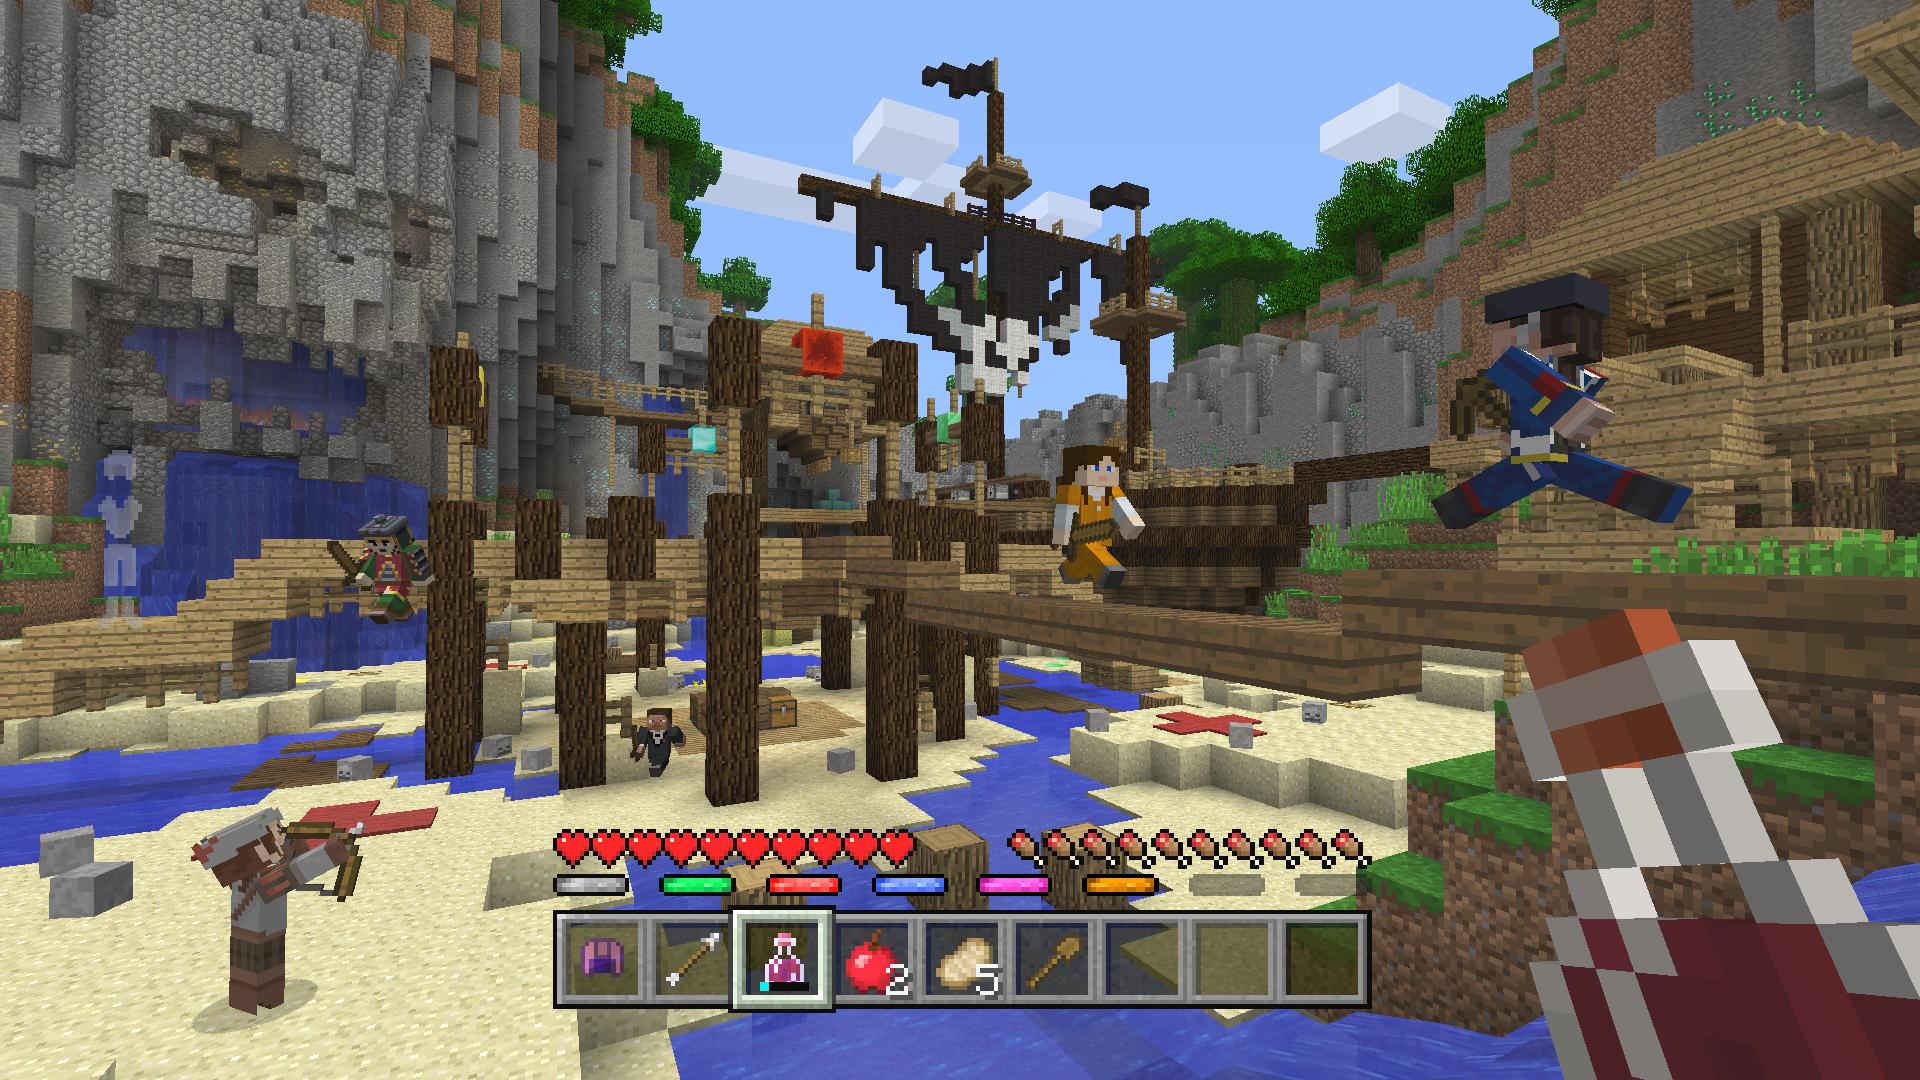 MinecraftIs Getting A PVP Battle Mode